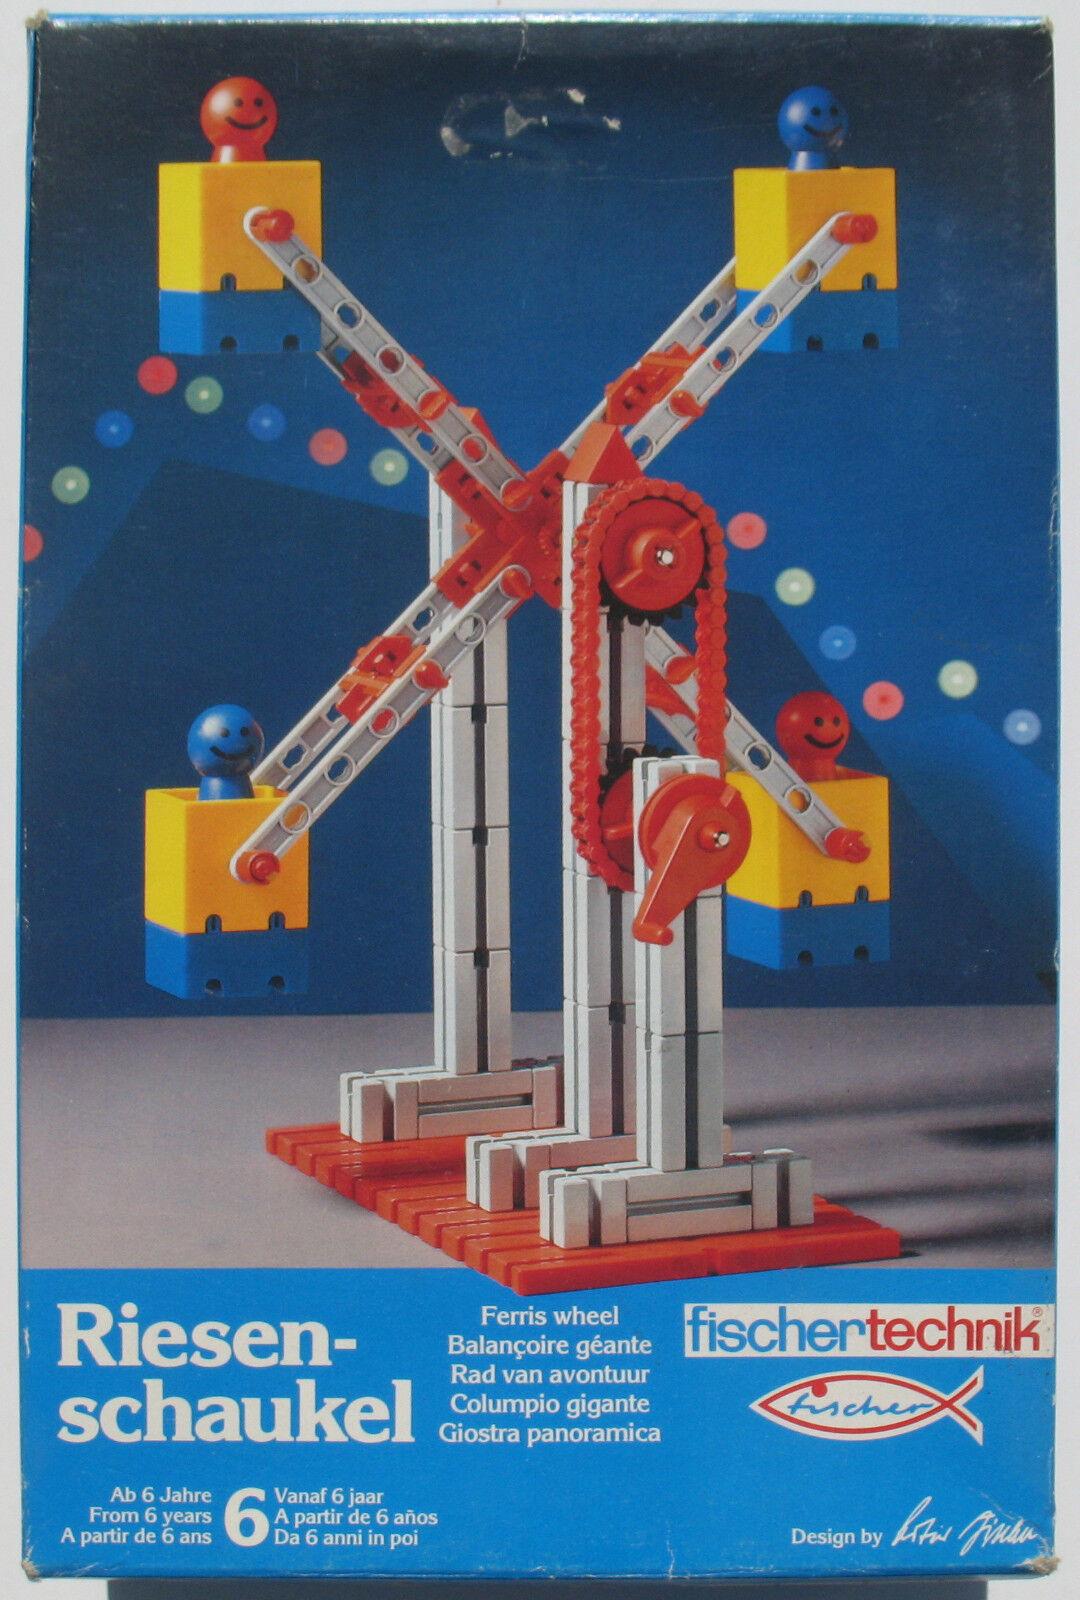 Fischertechnik 30453 - Riesenschaukel - Ferris Wheel - NEU&OVP - New